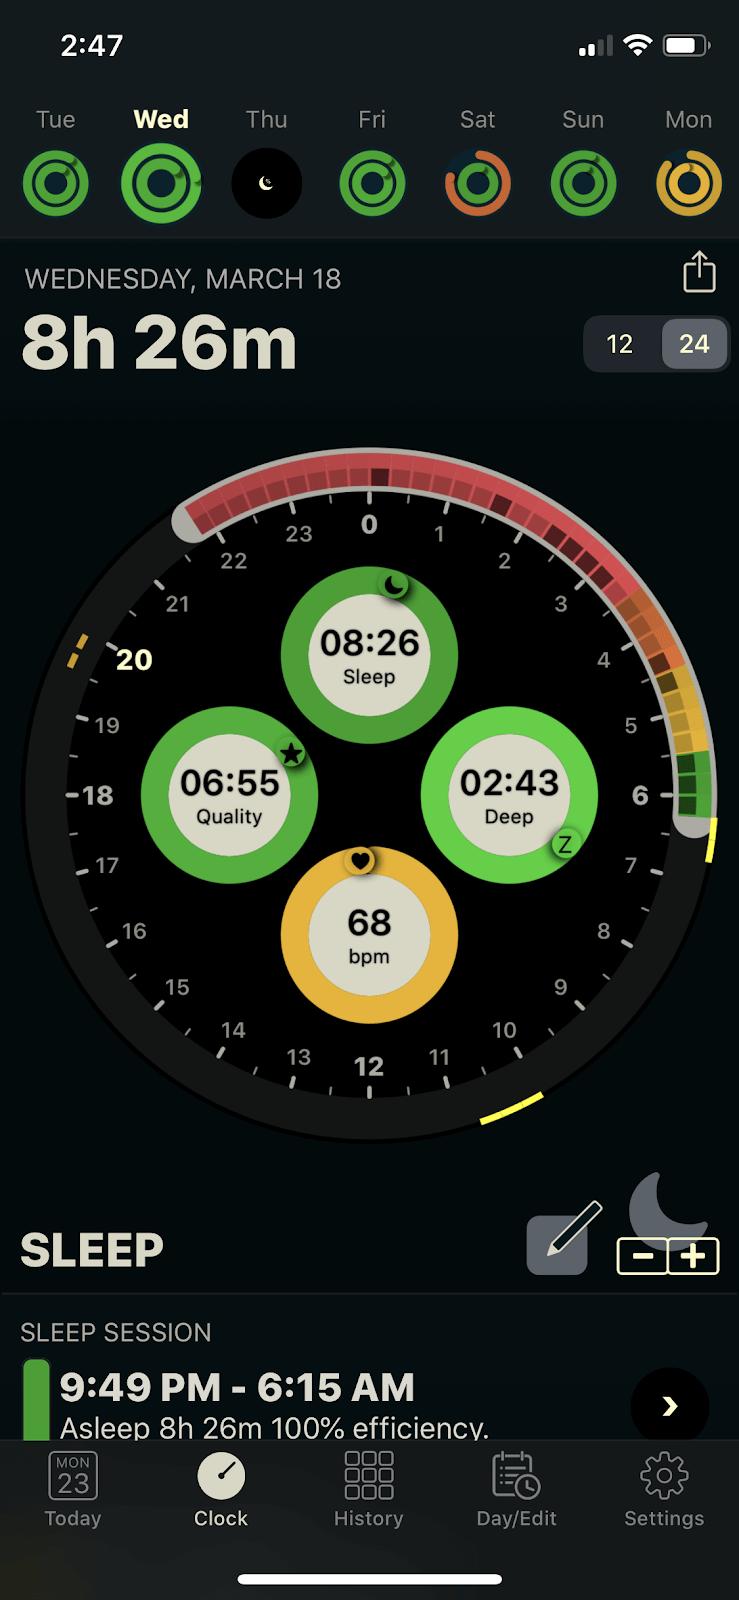 Dave's sleep pattern